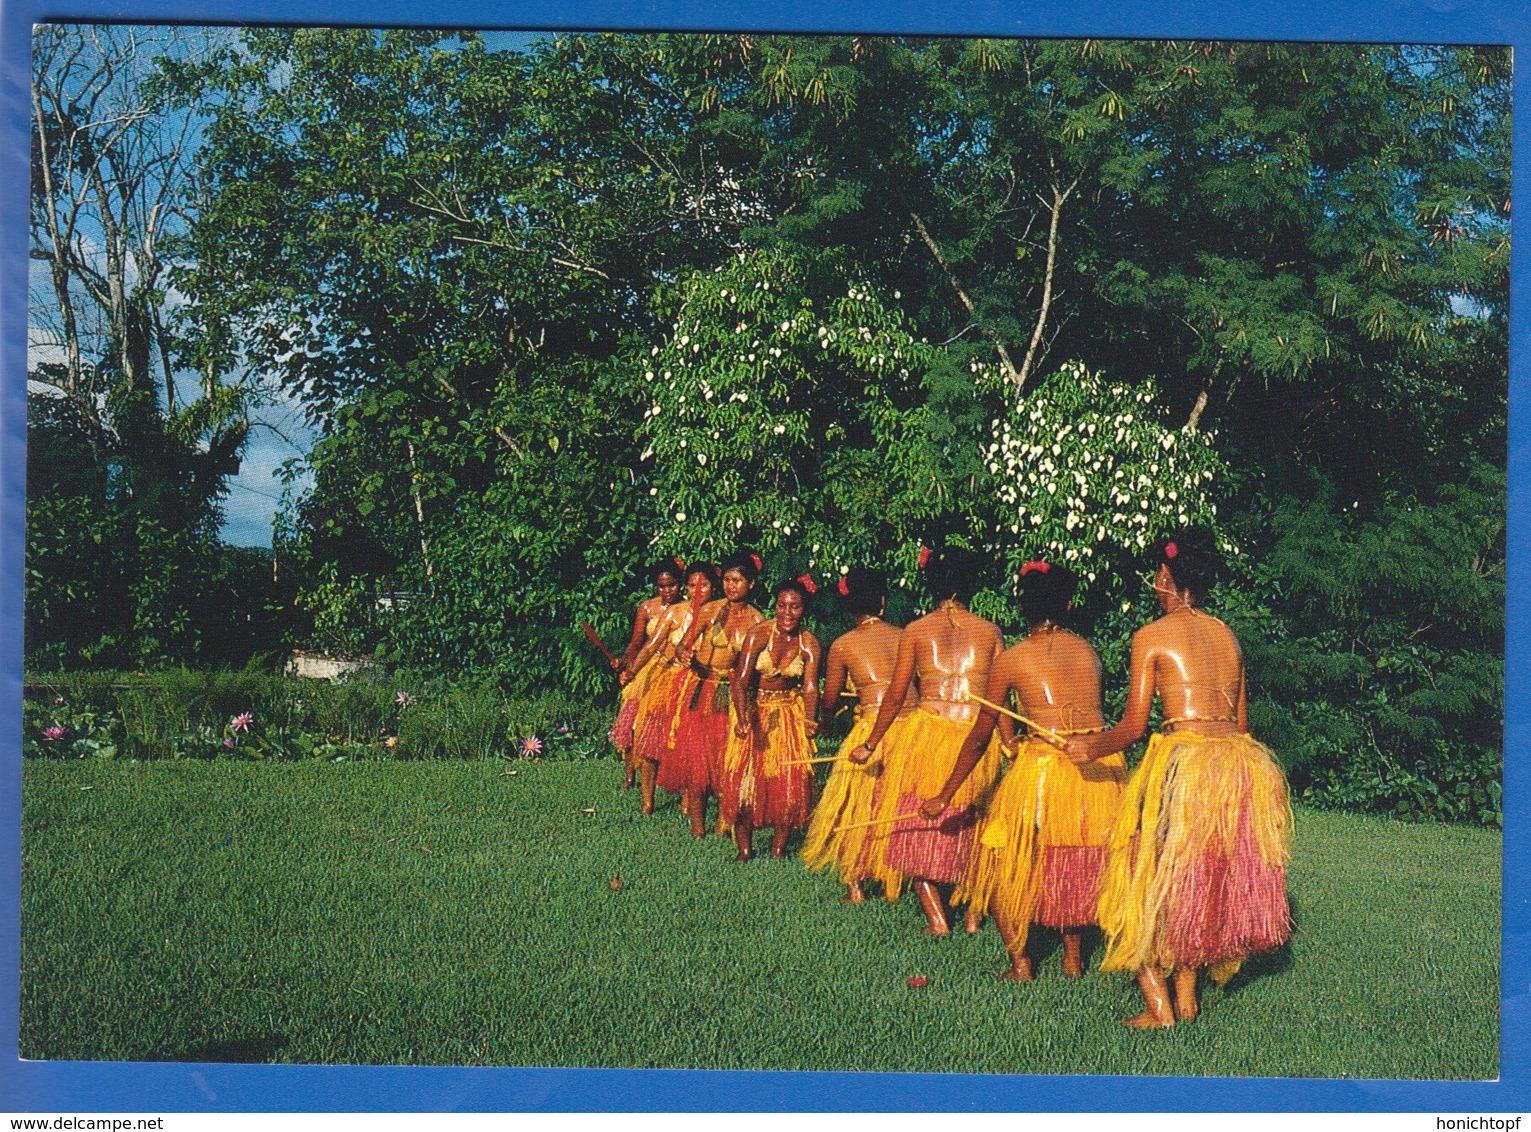 Palau; Traditional Dance - Palau